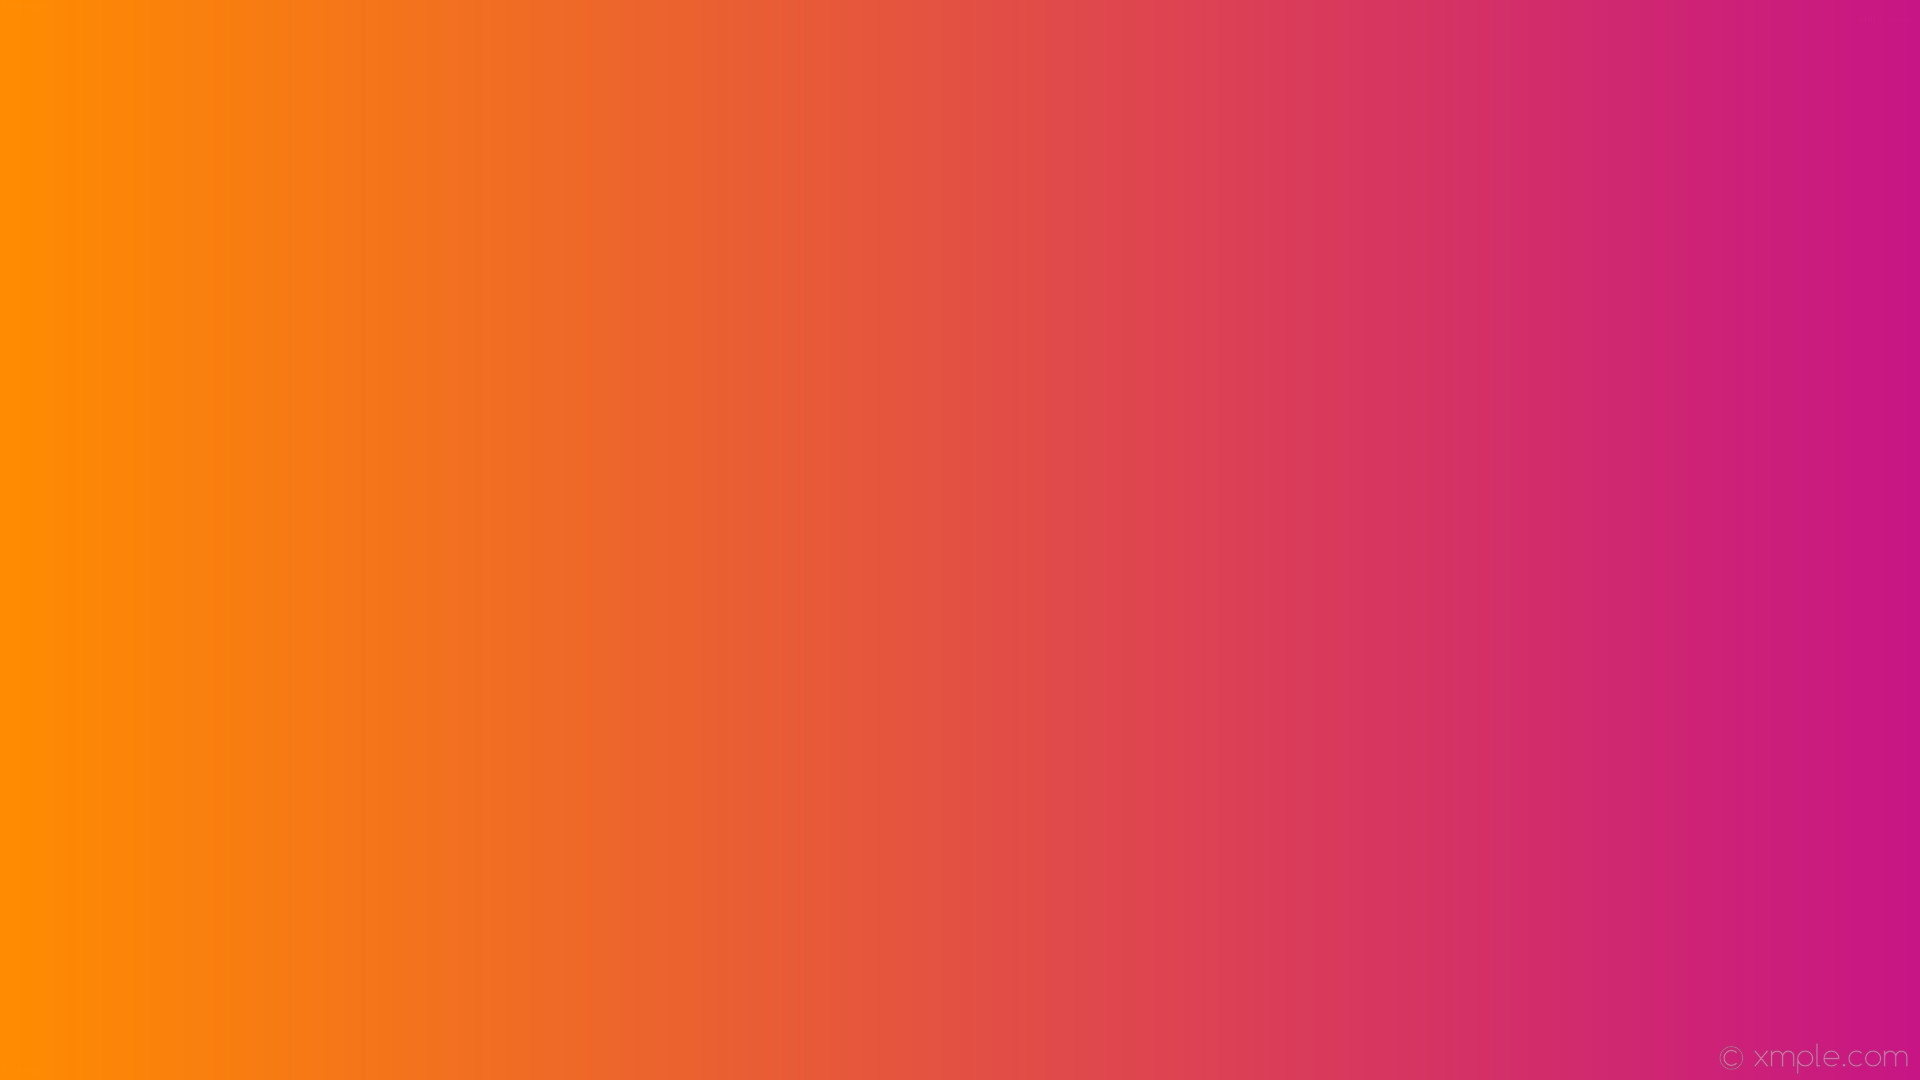 wallpaper linear gradient pink orange medium violet red dark orange #c71585  #ff8c00 0°